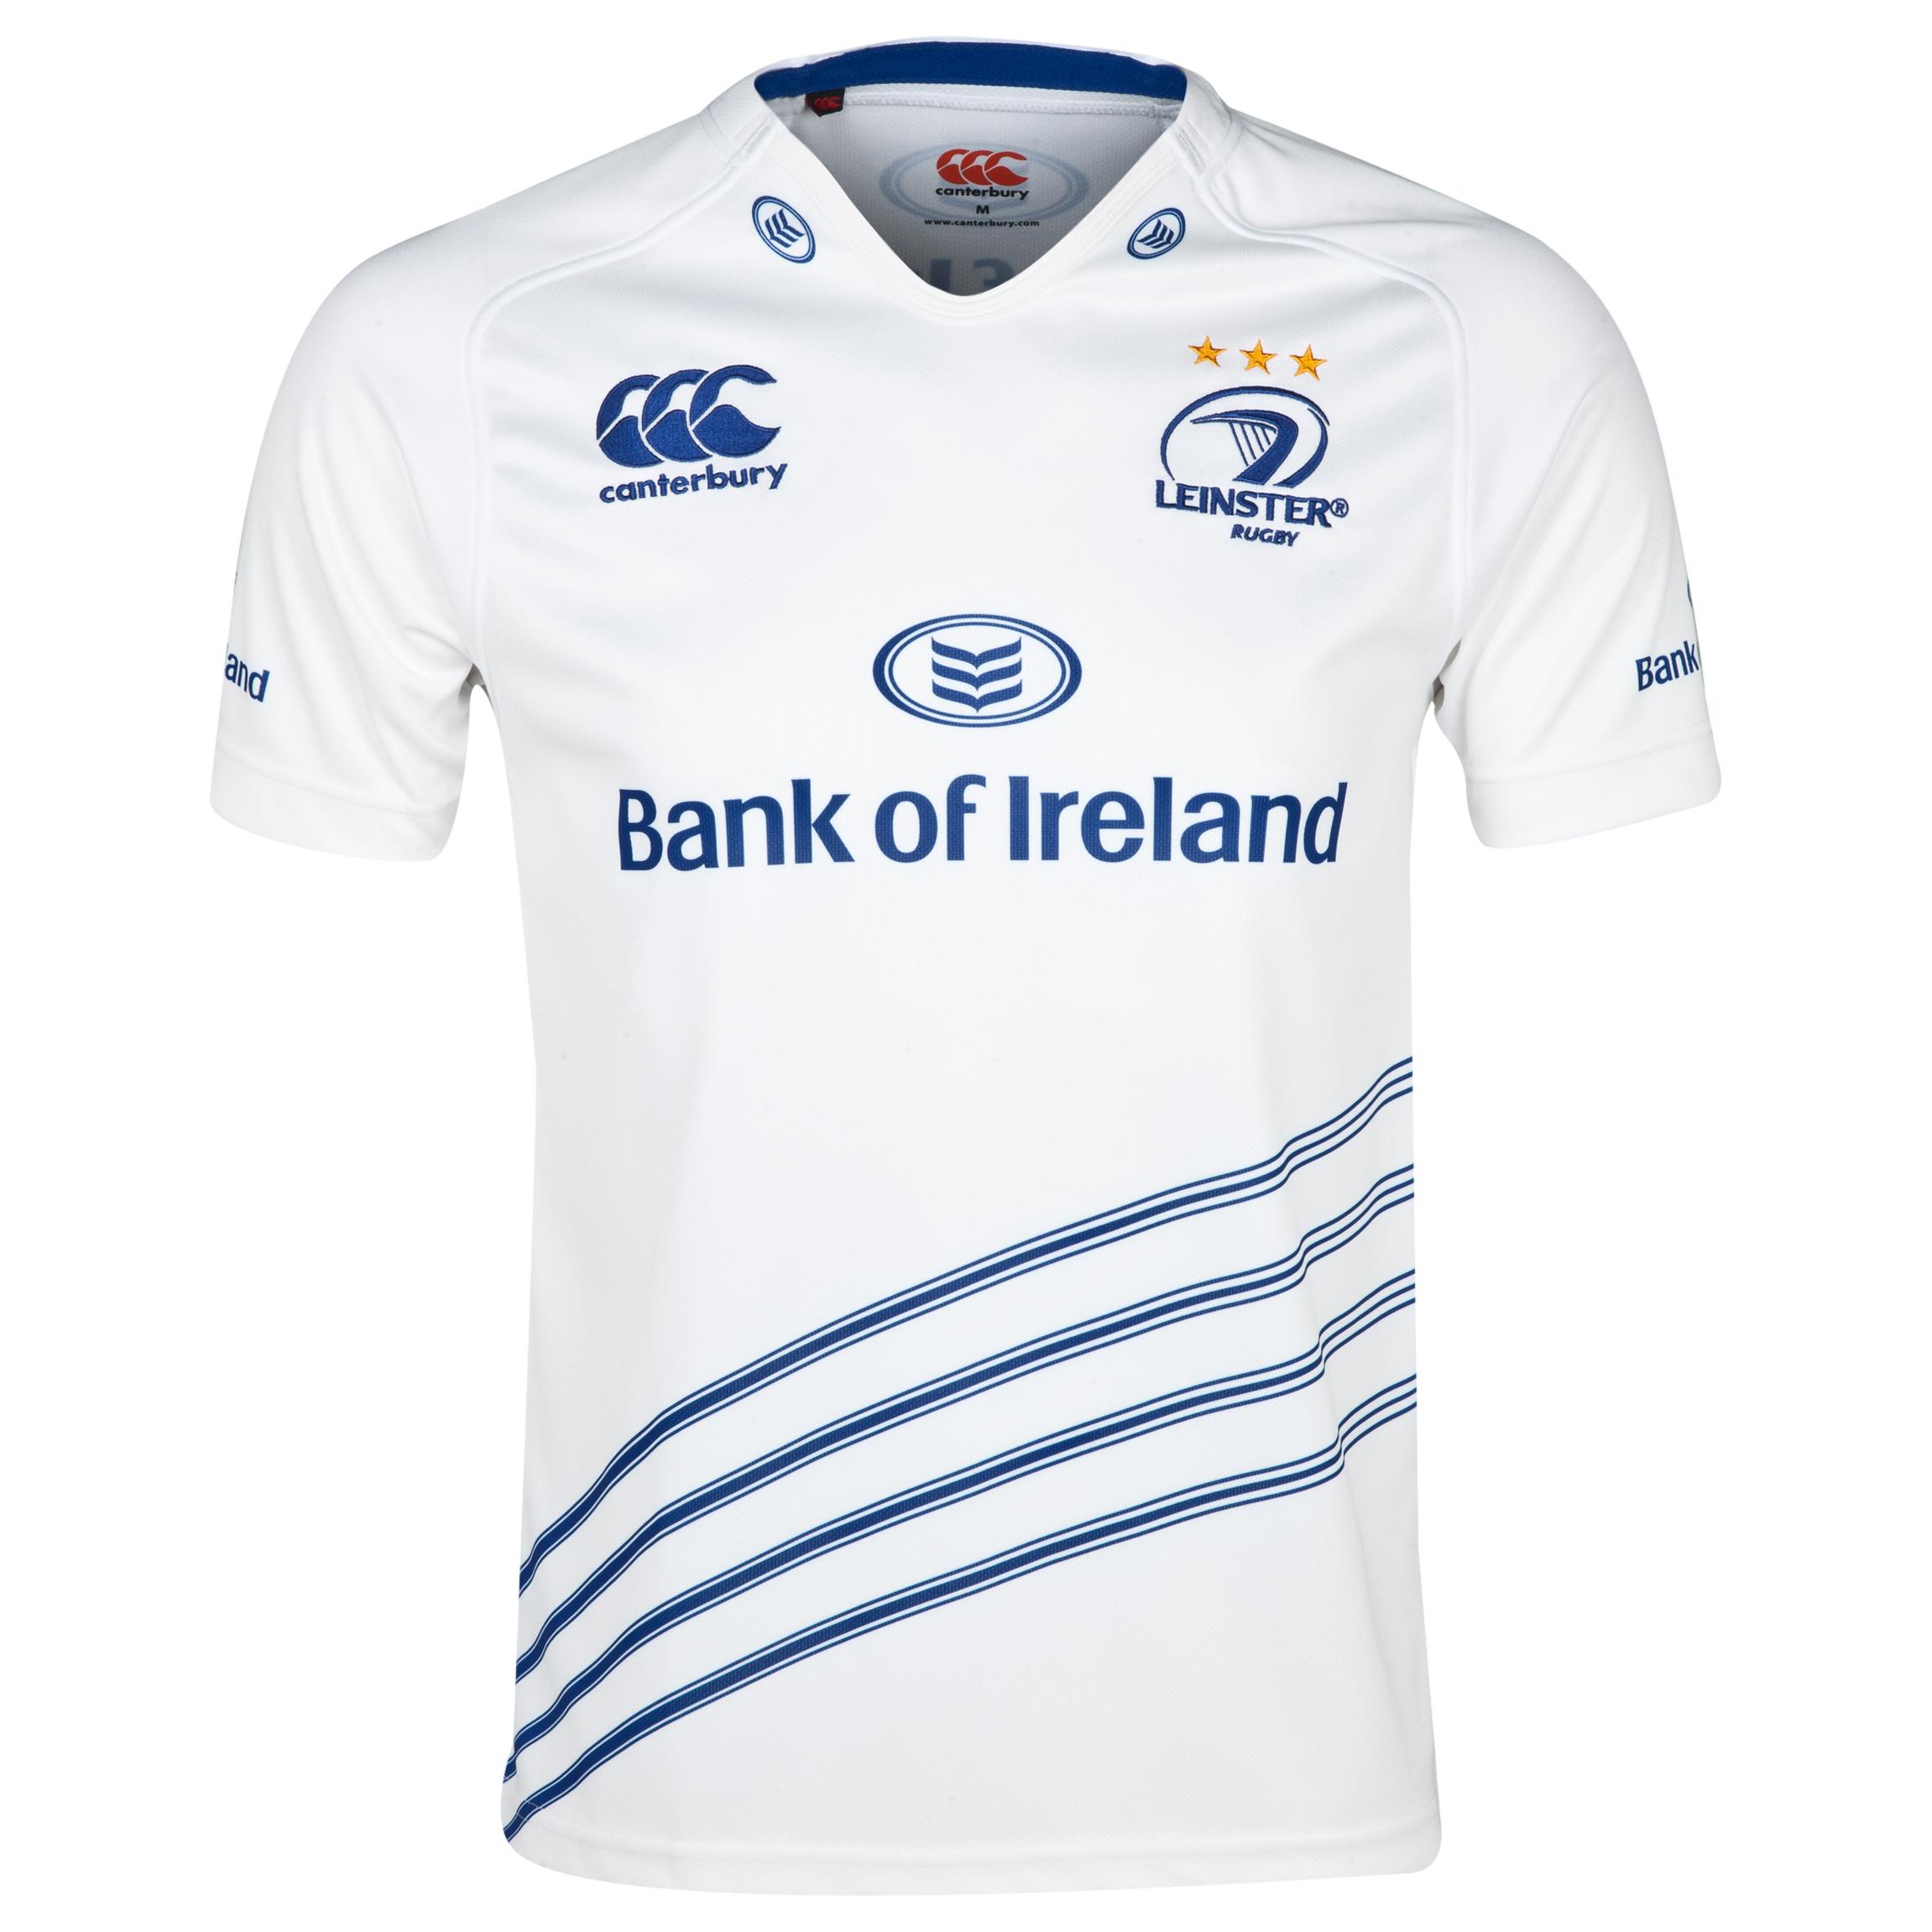 Leinster Alternate Pro Rugby Shirt 2013/14 - White/Leinster Blue White